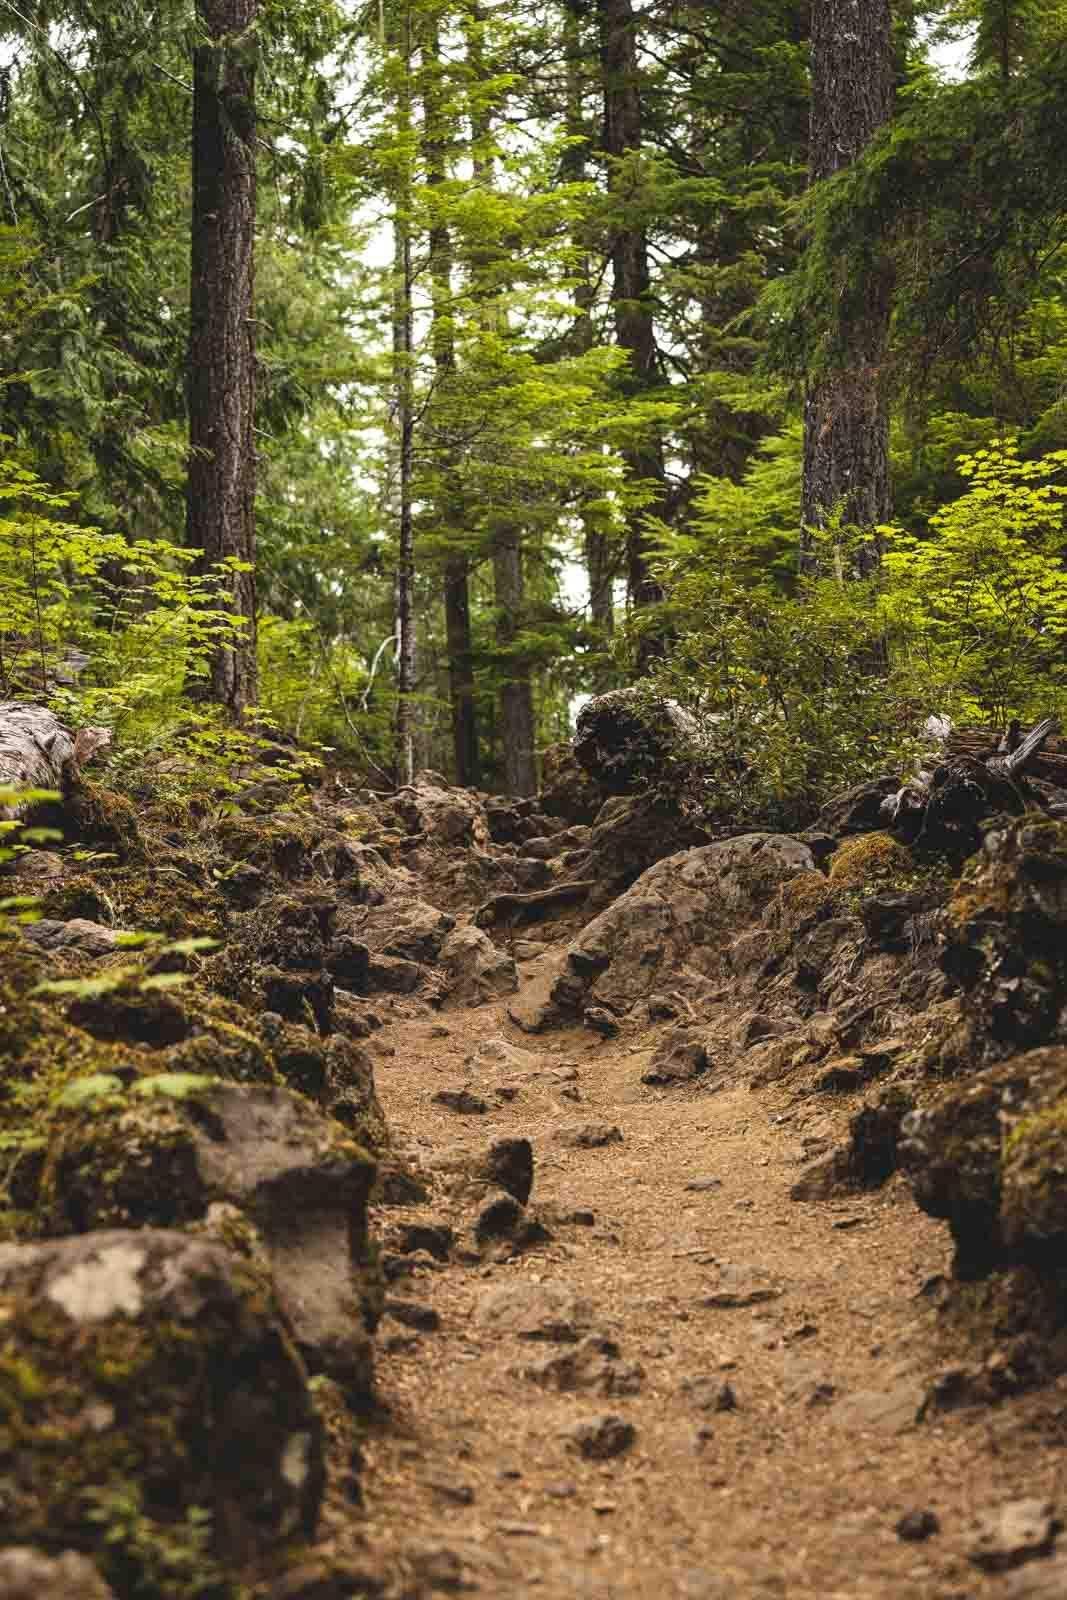 McKenzie River Trail through the woods